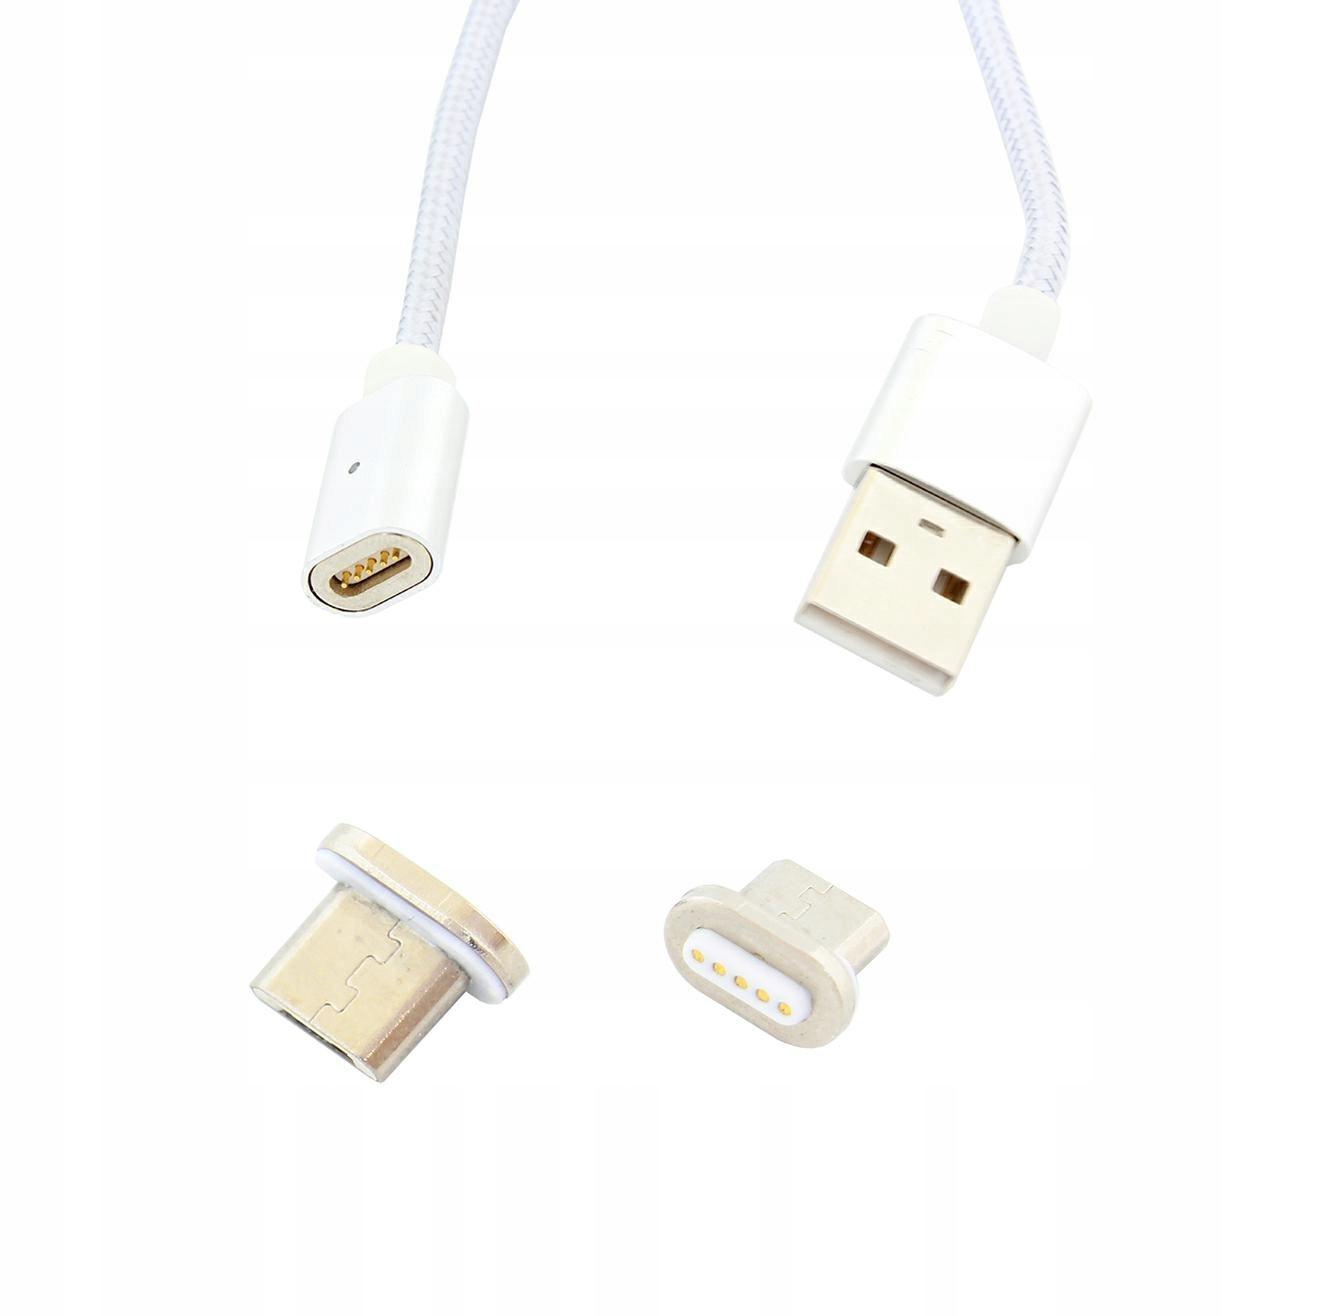 MAGNETYCZNY KABEL 1m MICRO USB DO TELEFONU OPLOT